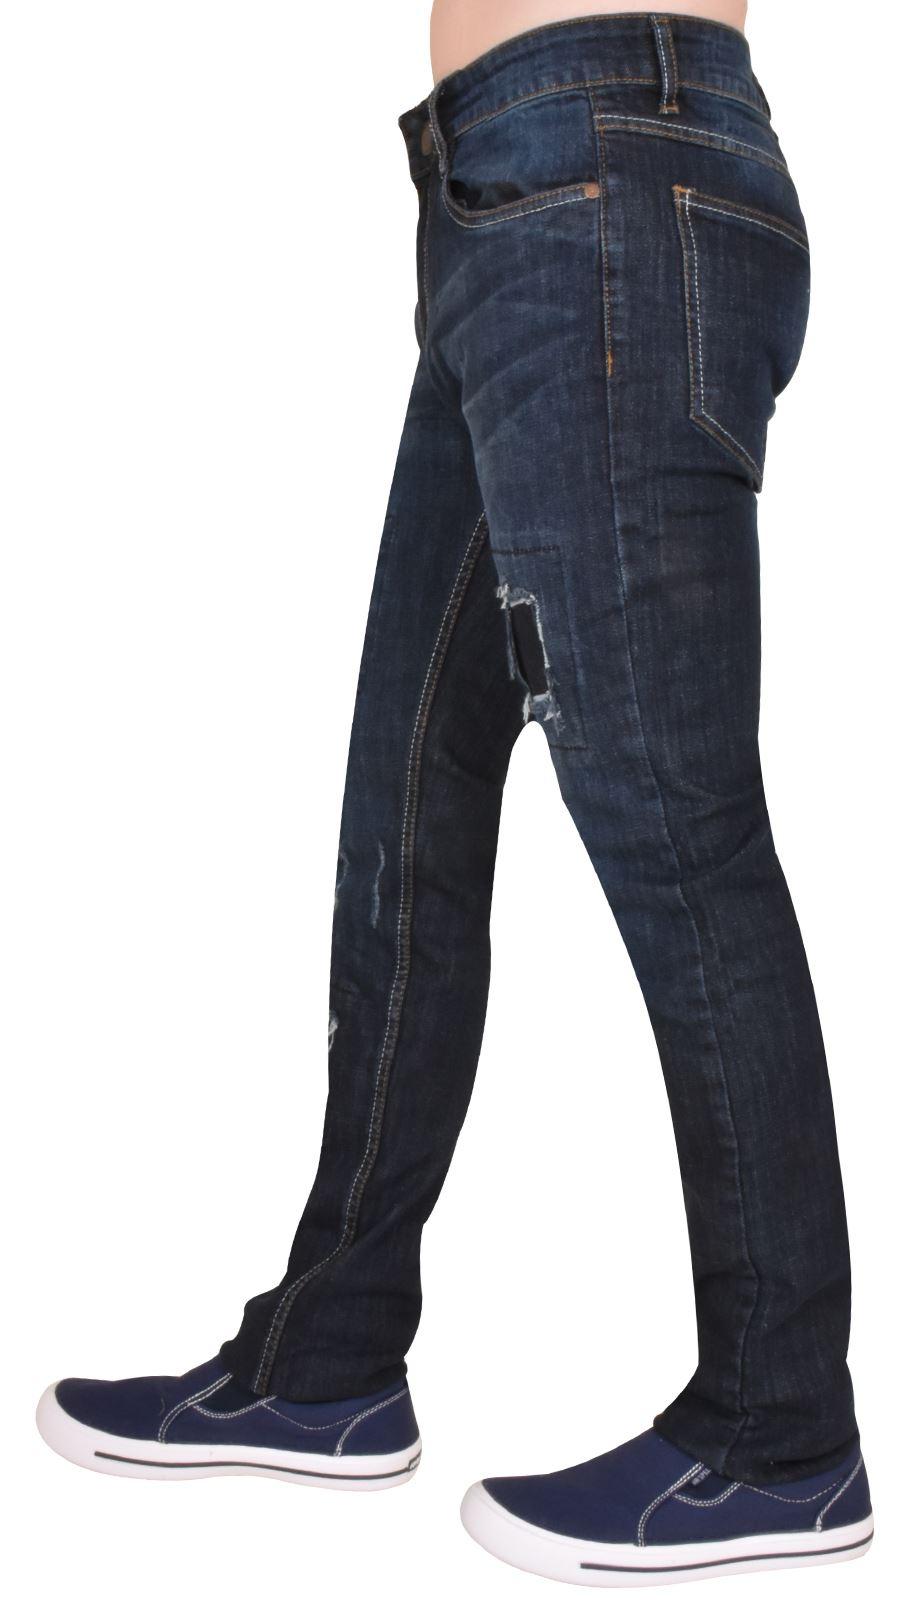 New Mens Slim Fit Jeans Ripped /& Repair 5 Pocket Western Straight Leg Denim